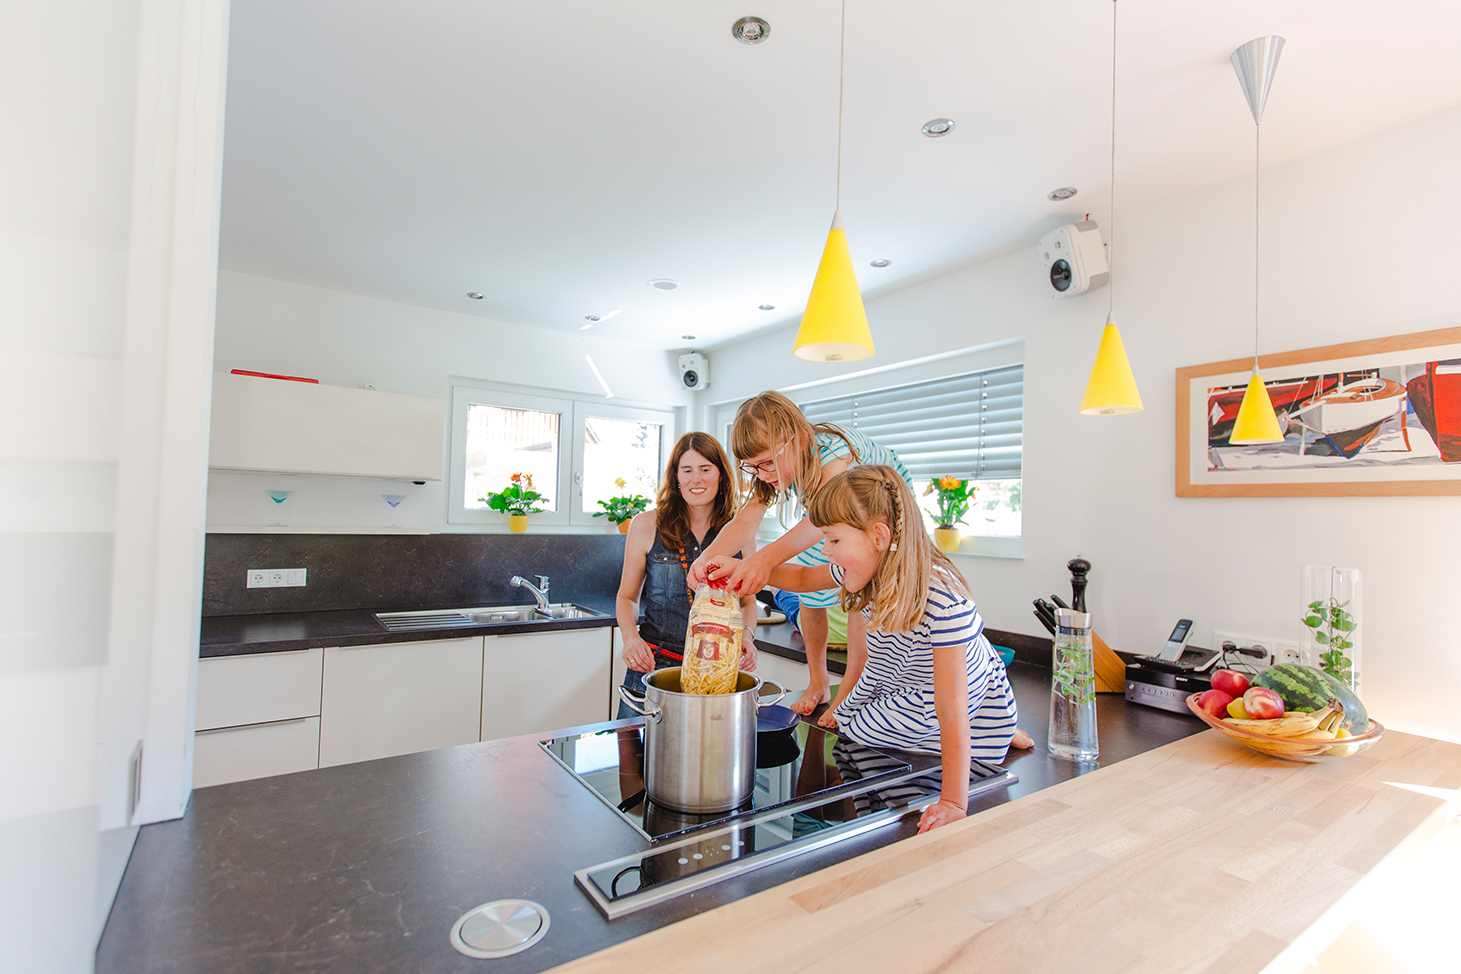 Fischerhaus Bodenwöhr baupaare berichten familie prof dr troll münchen fischerhaus